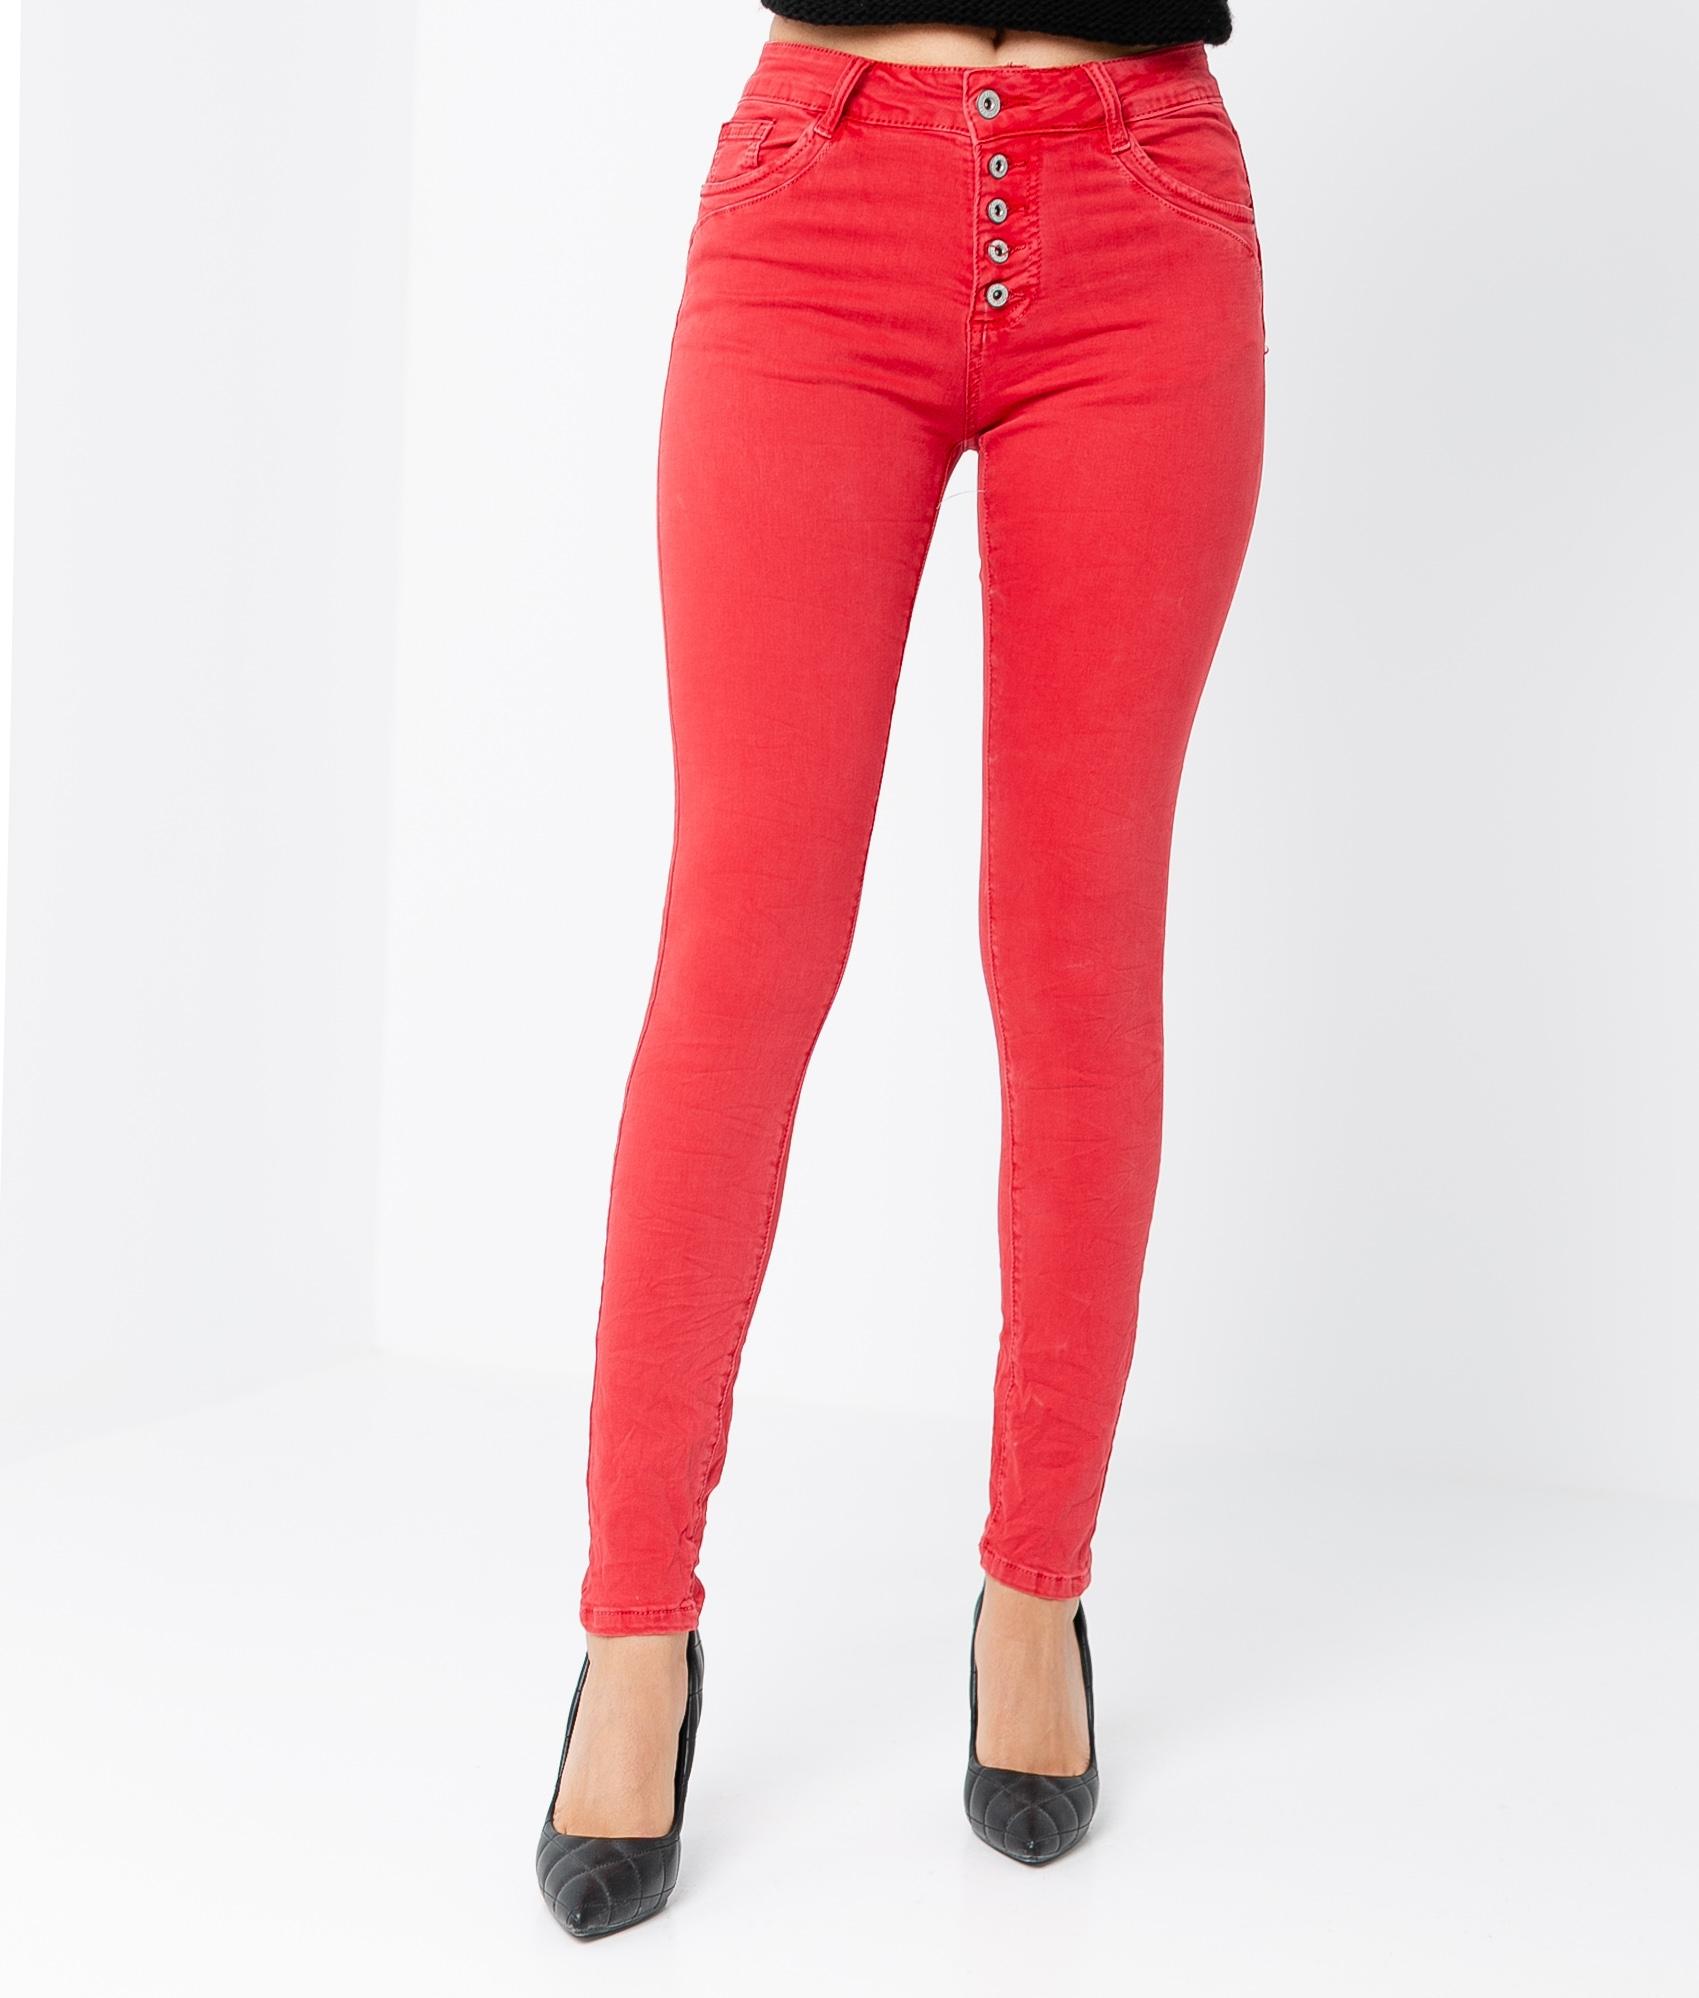 Pantalon Mainer - Rojo